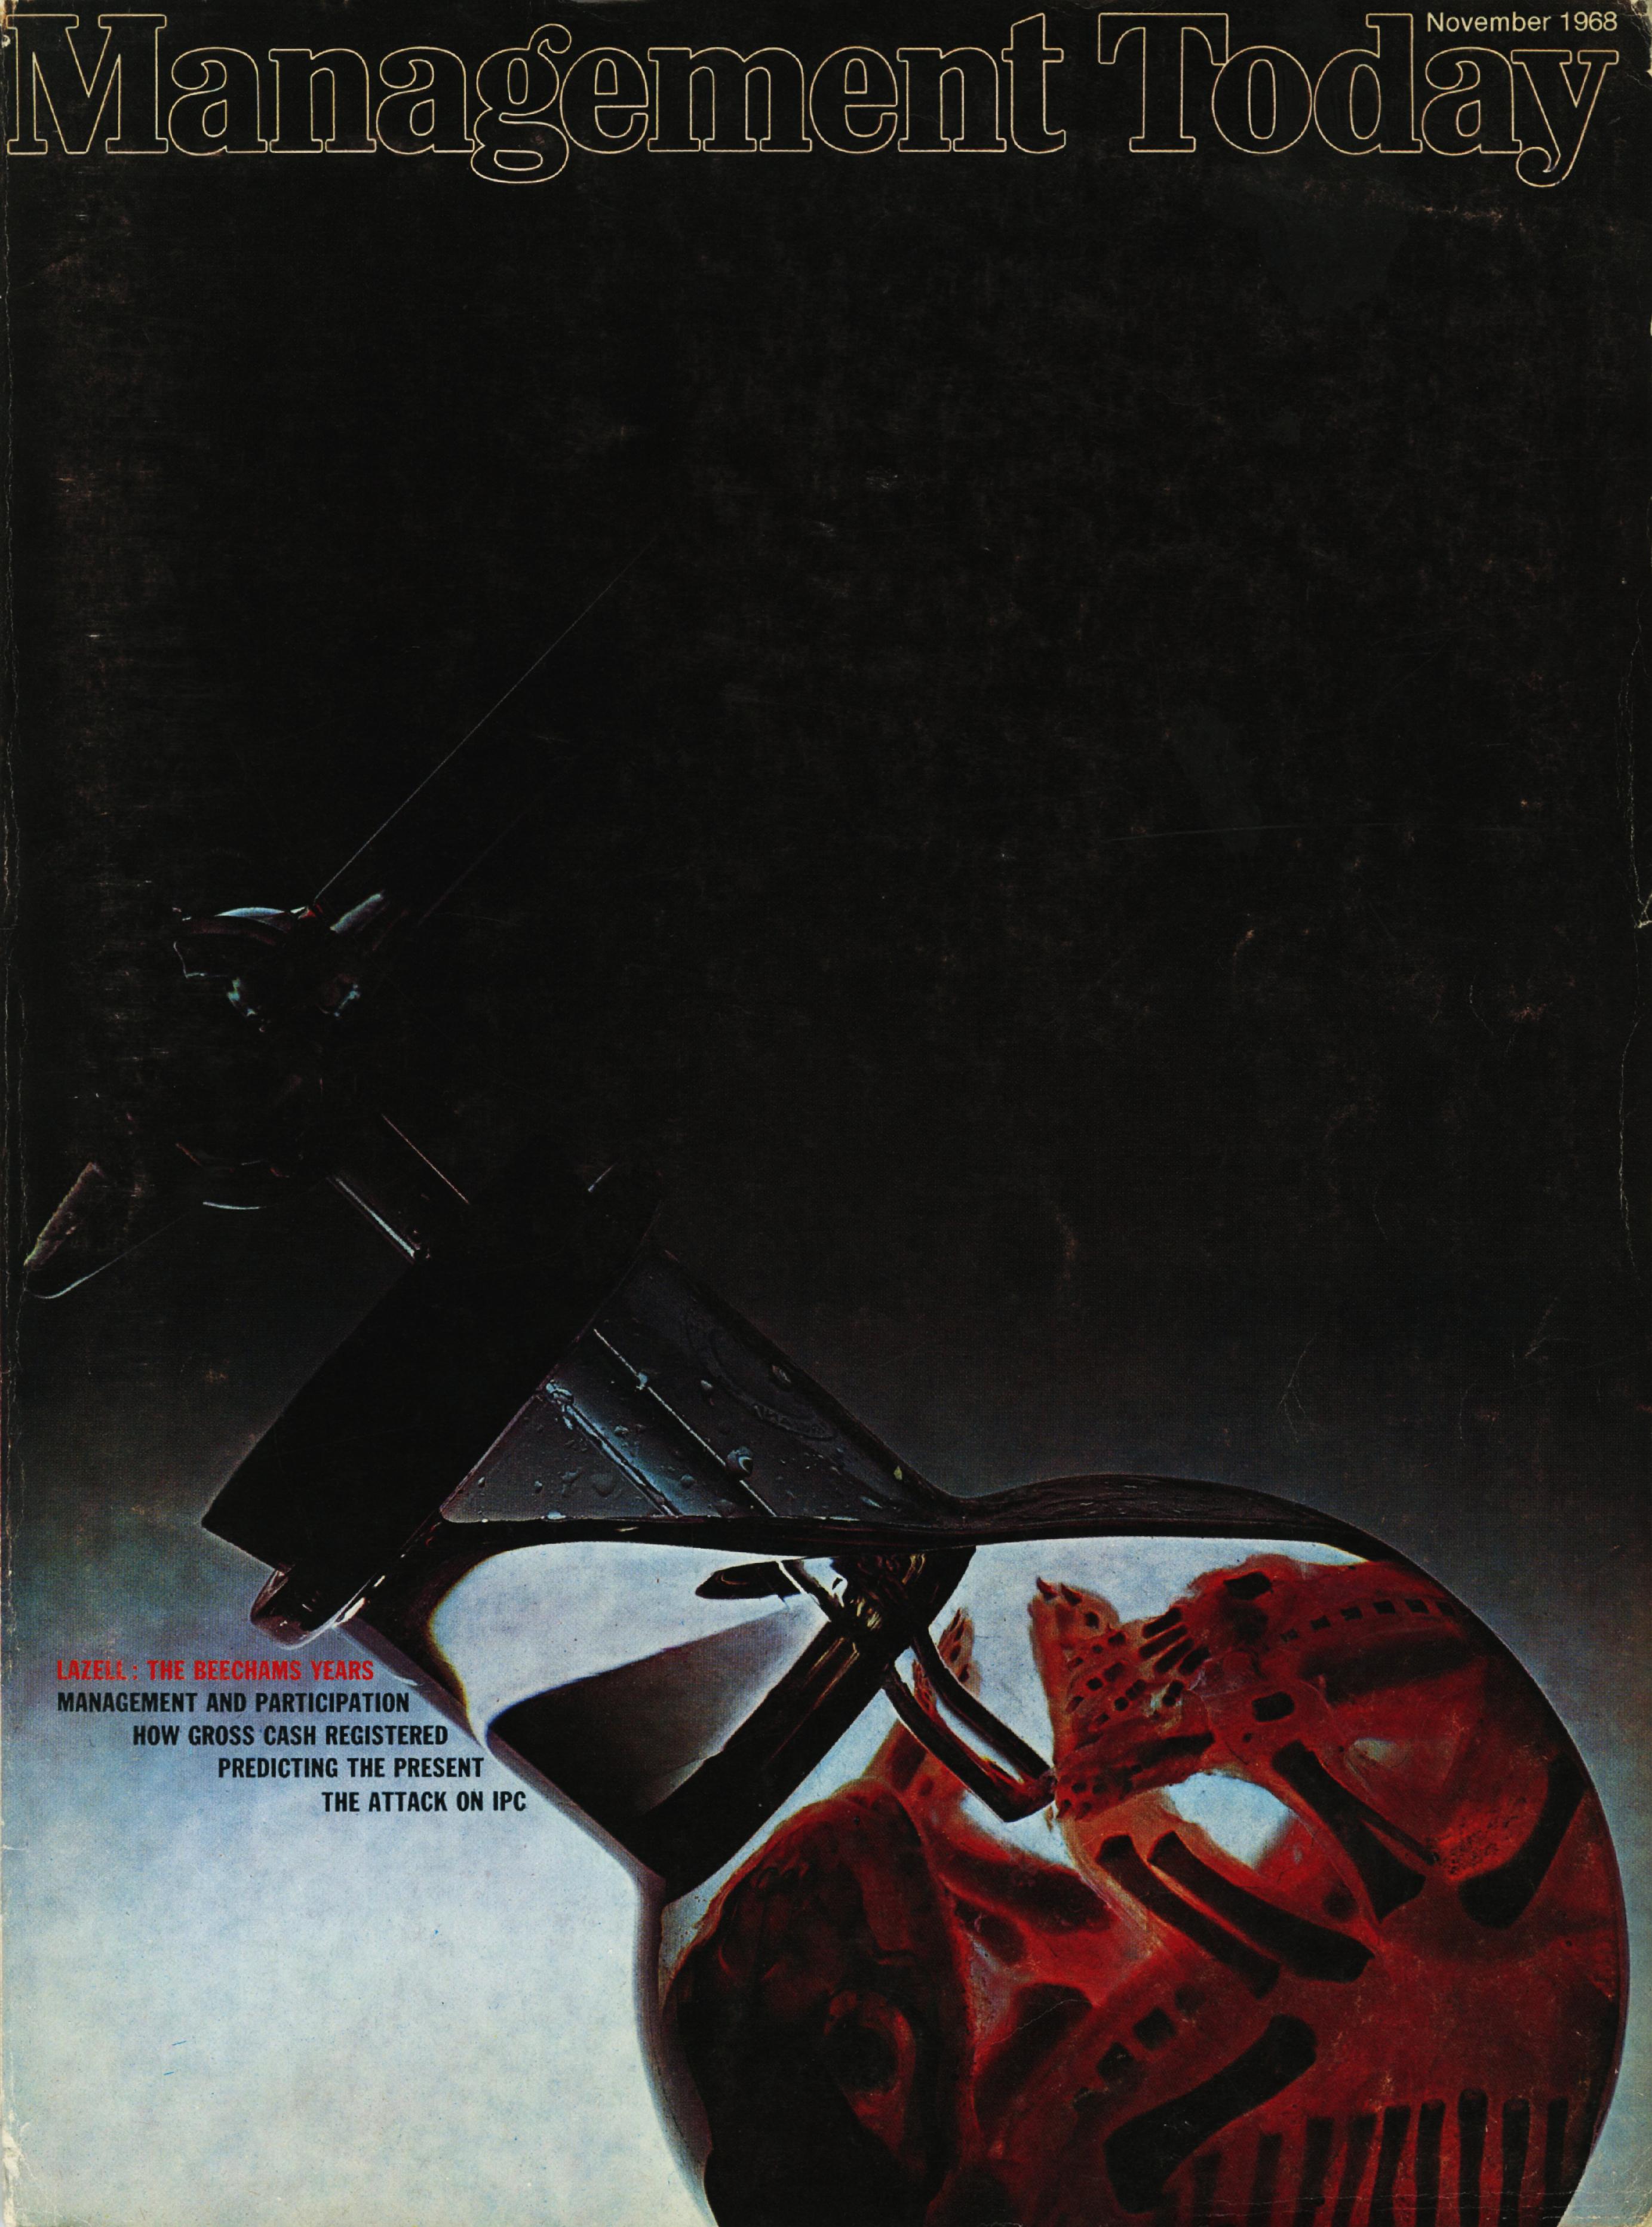 Lester Bookbinder, Management Today 'Blood Tube'**-01